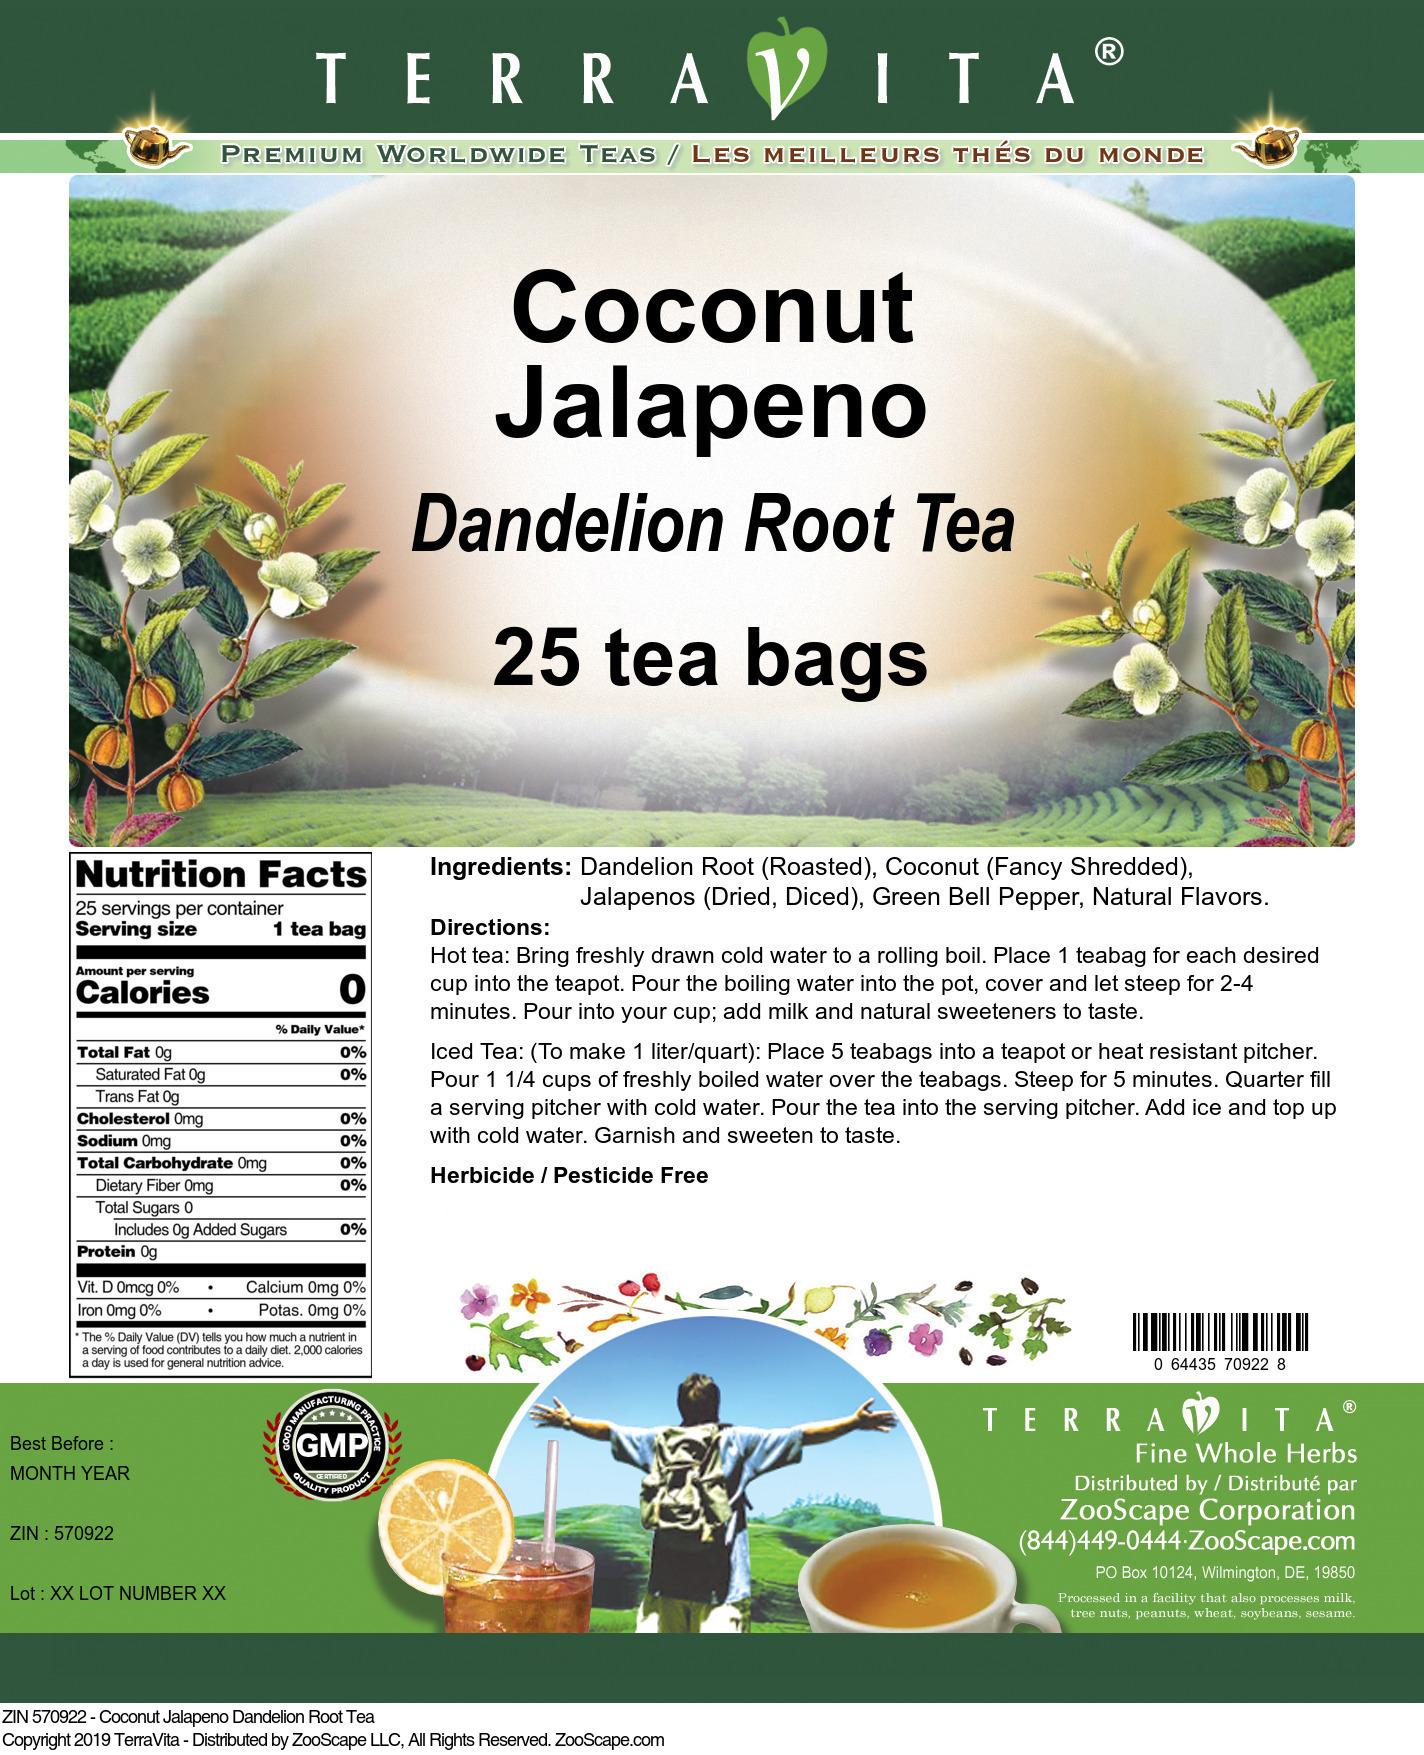 Coconut Jalapeno Dandelion Root Tea